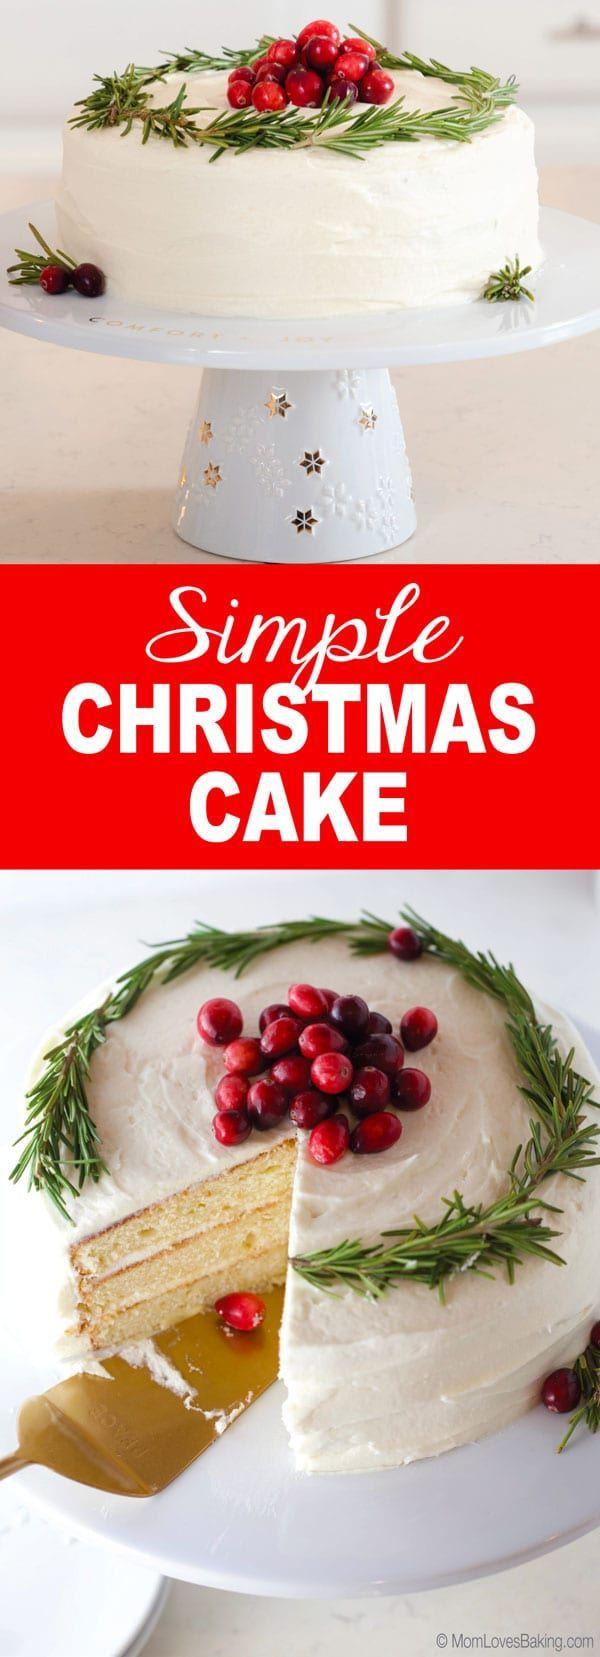 Simple Christmas Cake Recipe Christmas cakes easy